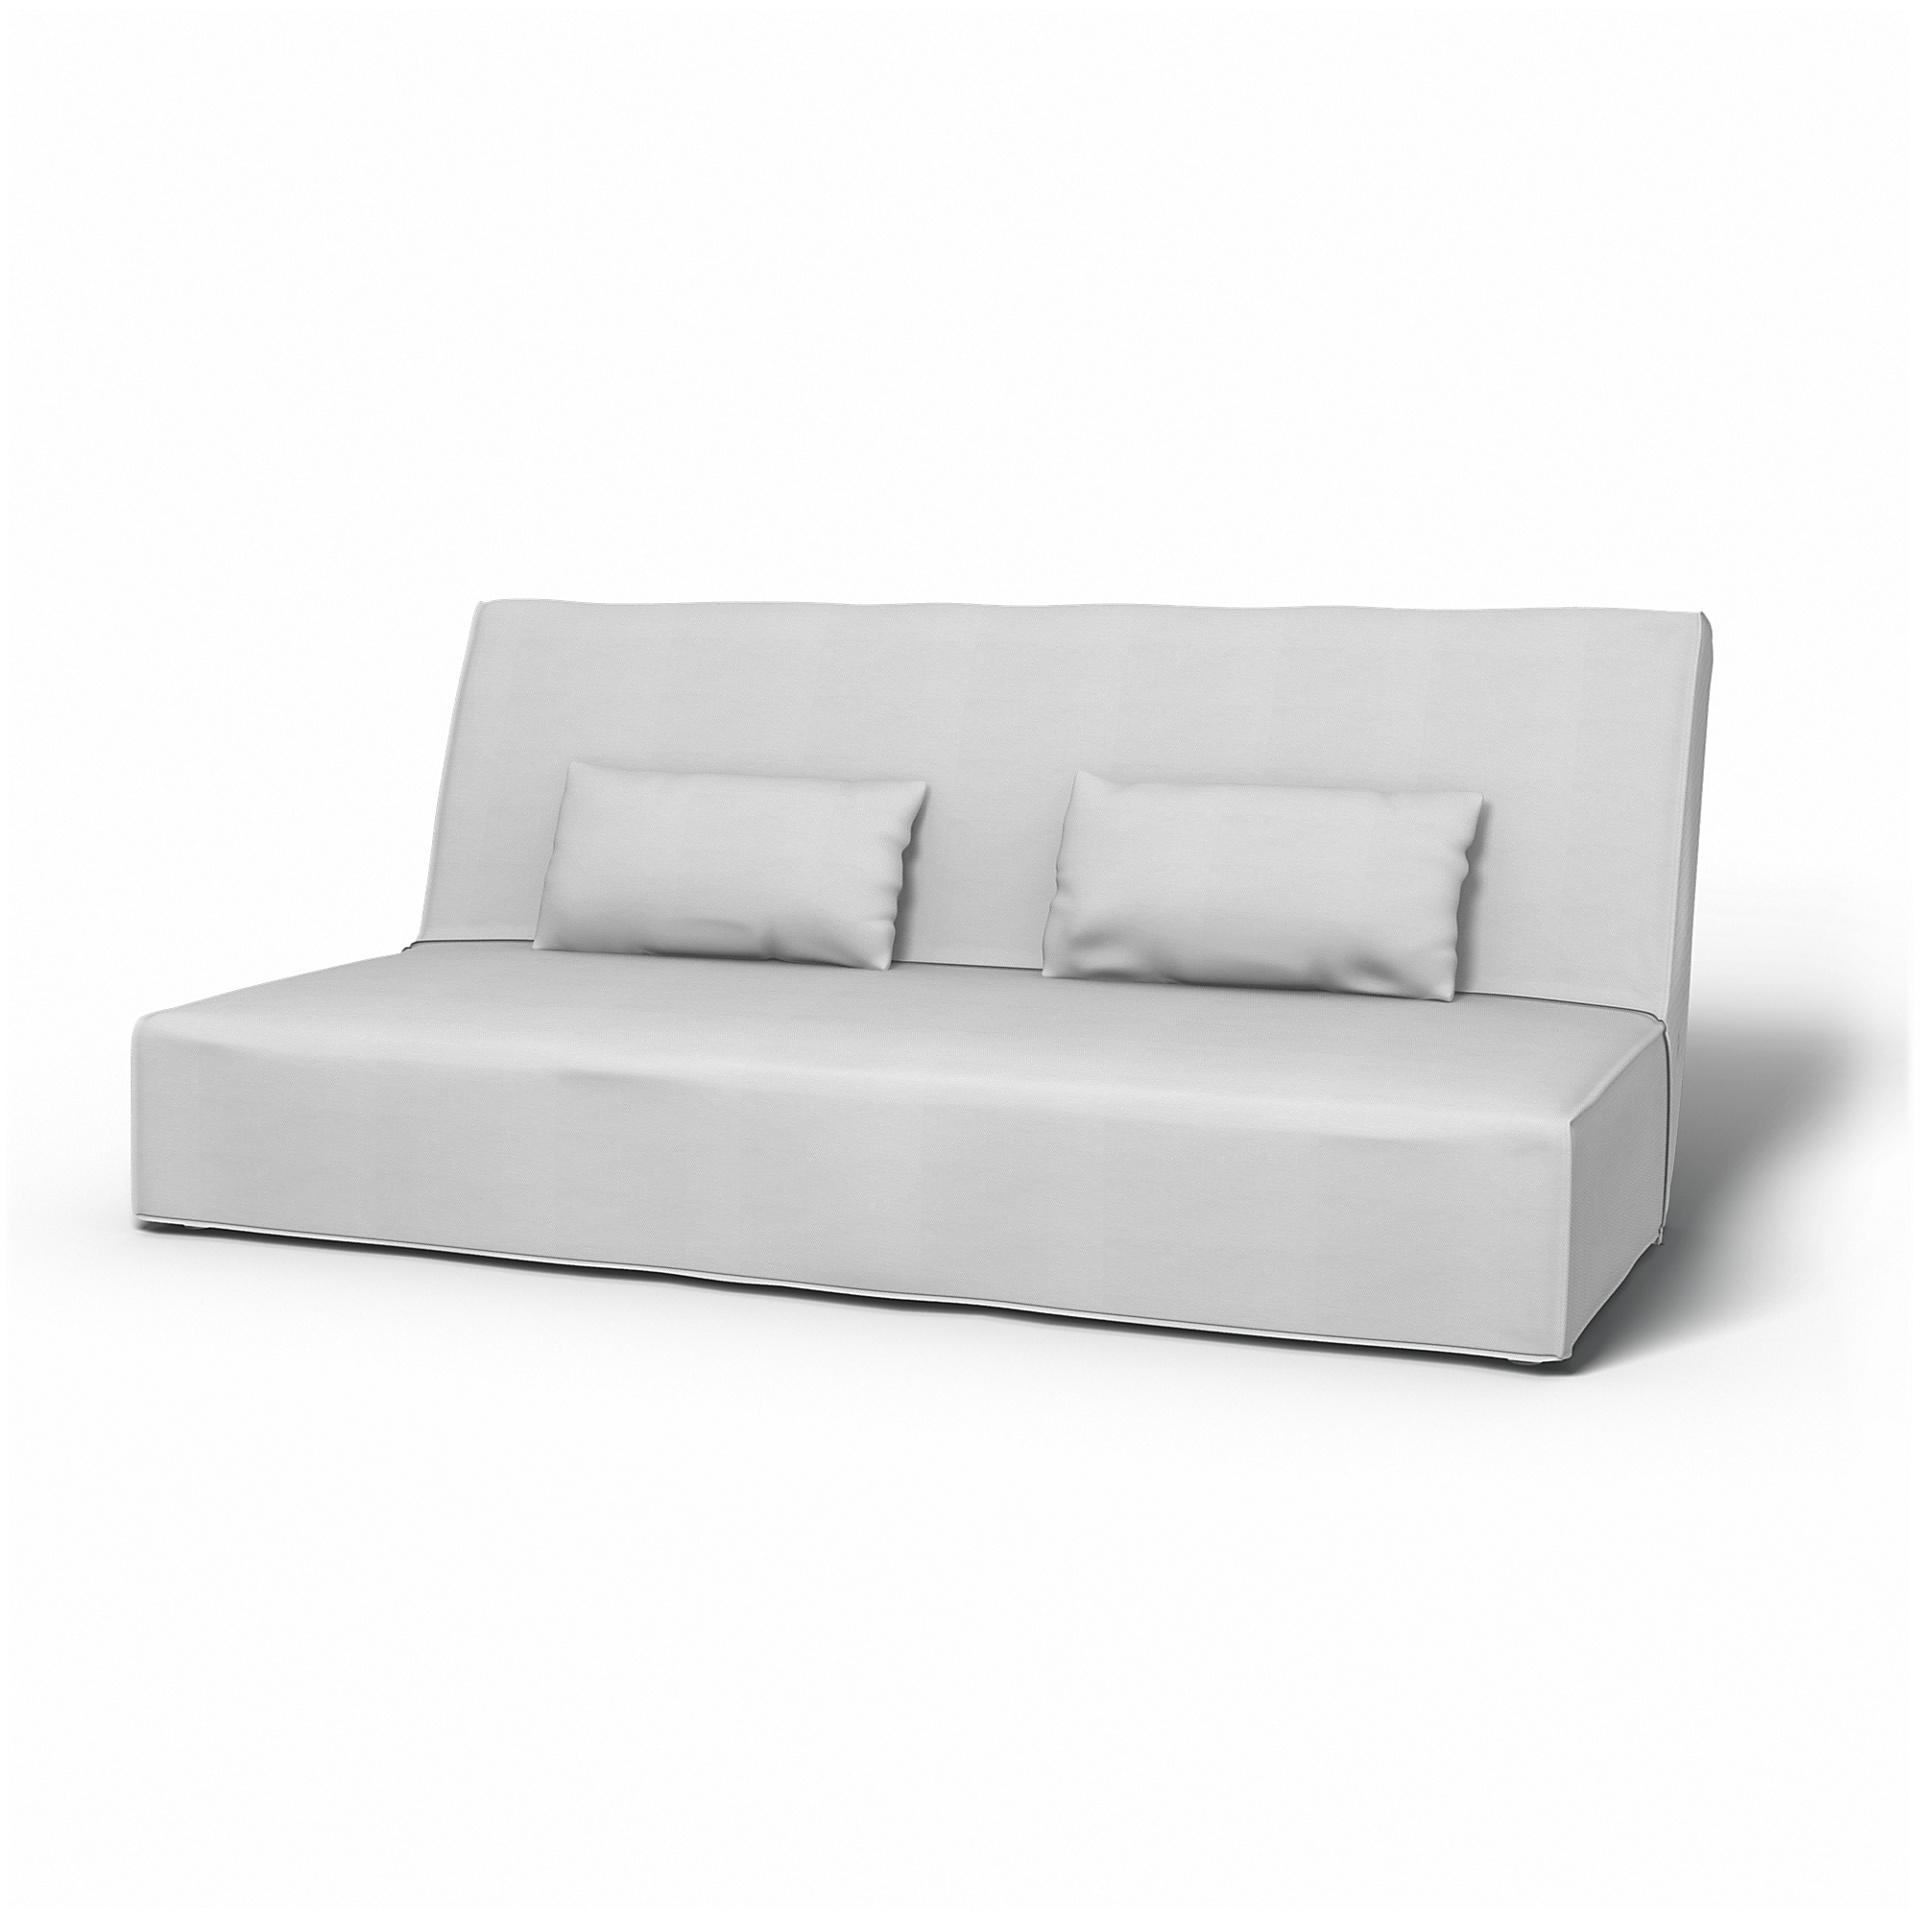 Ikea Beddinge 3 Seater Sofa Bed Cover Long Skirt Bemz Bemz